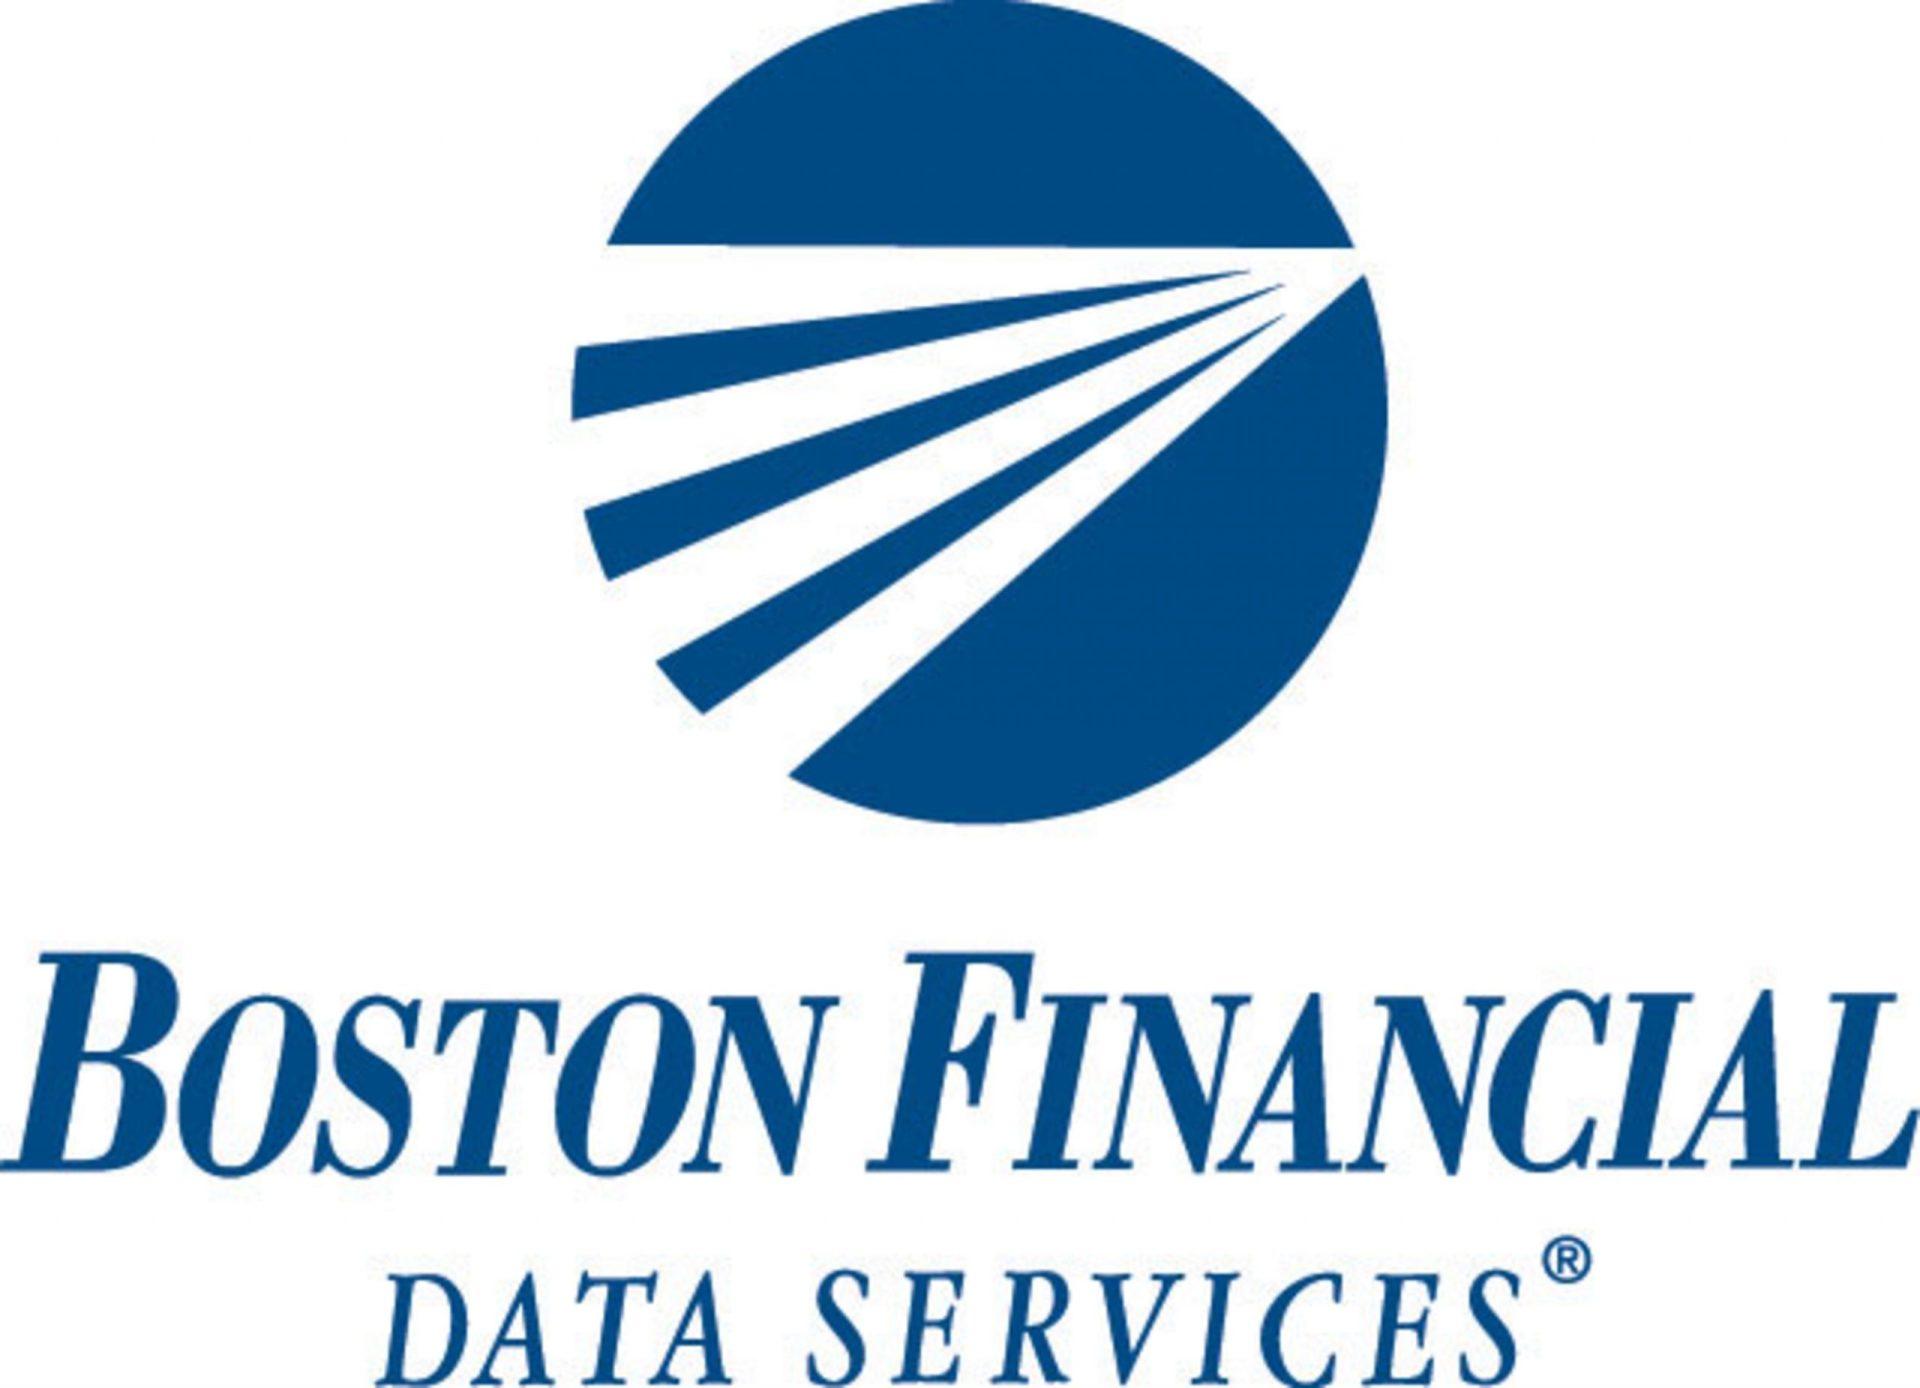 boston financial data services Logo